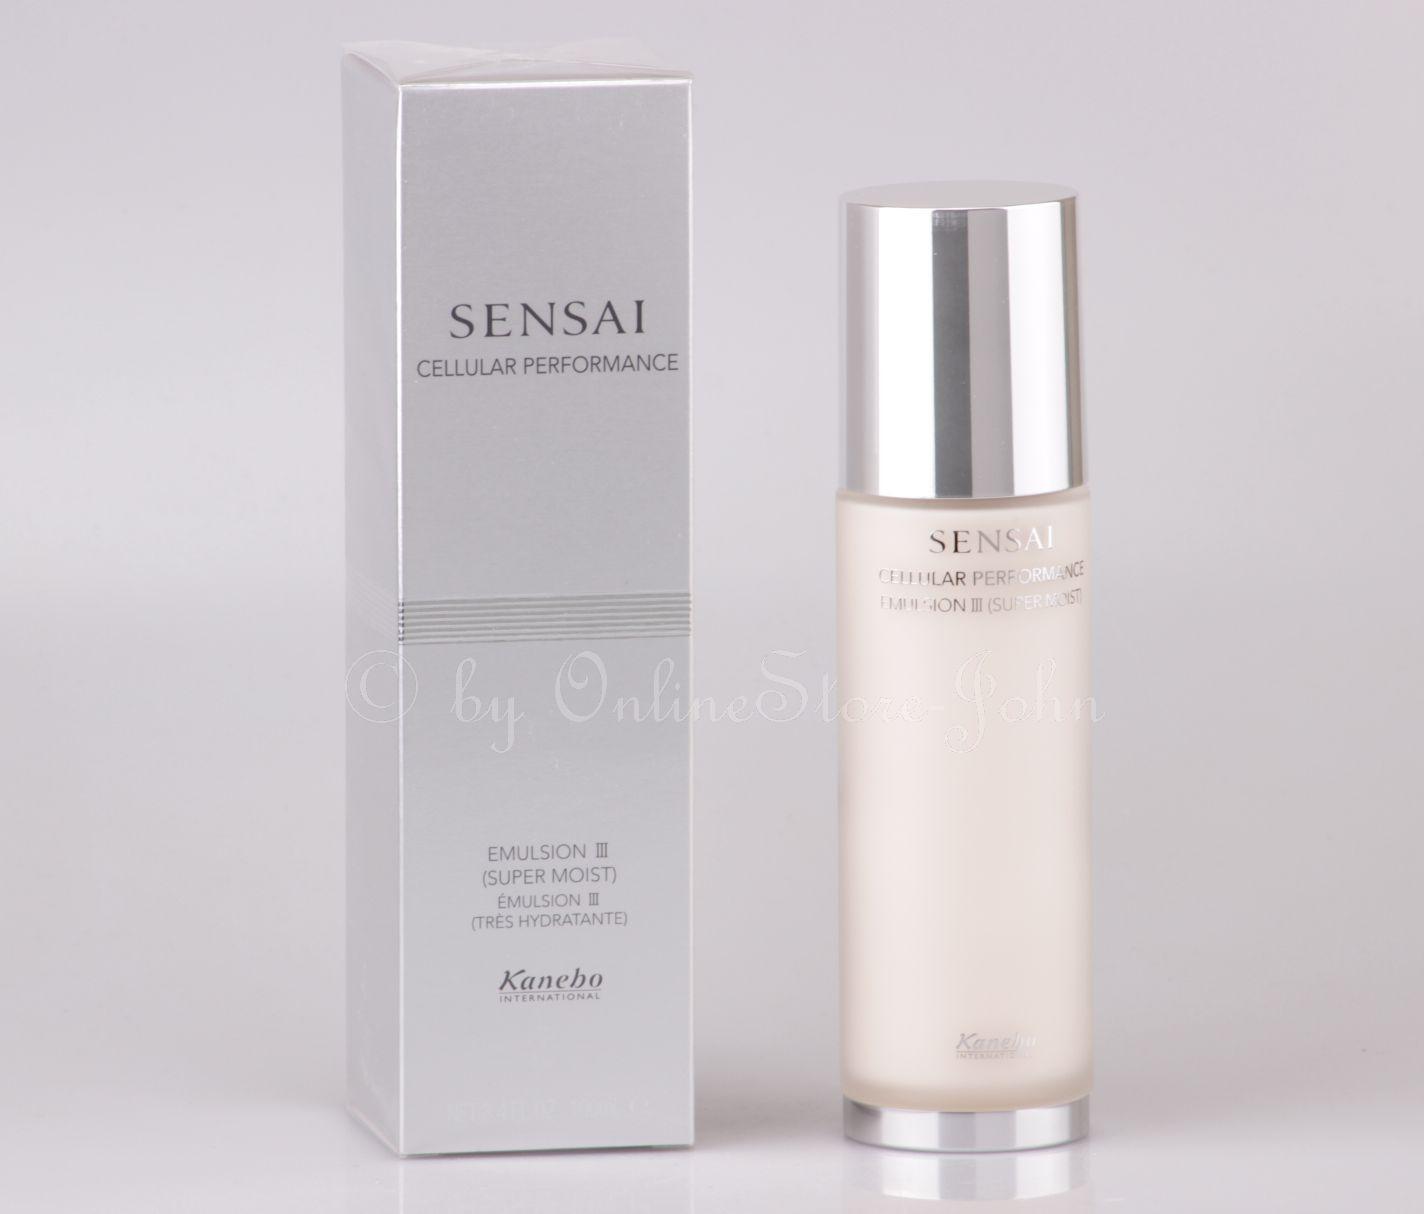 20076b6623e KANEBO Sensai - Cellular Performance Emulsion III (Super Moist) 100ml